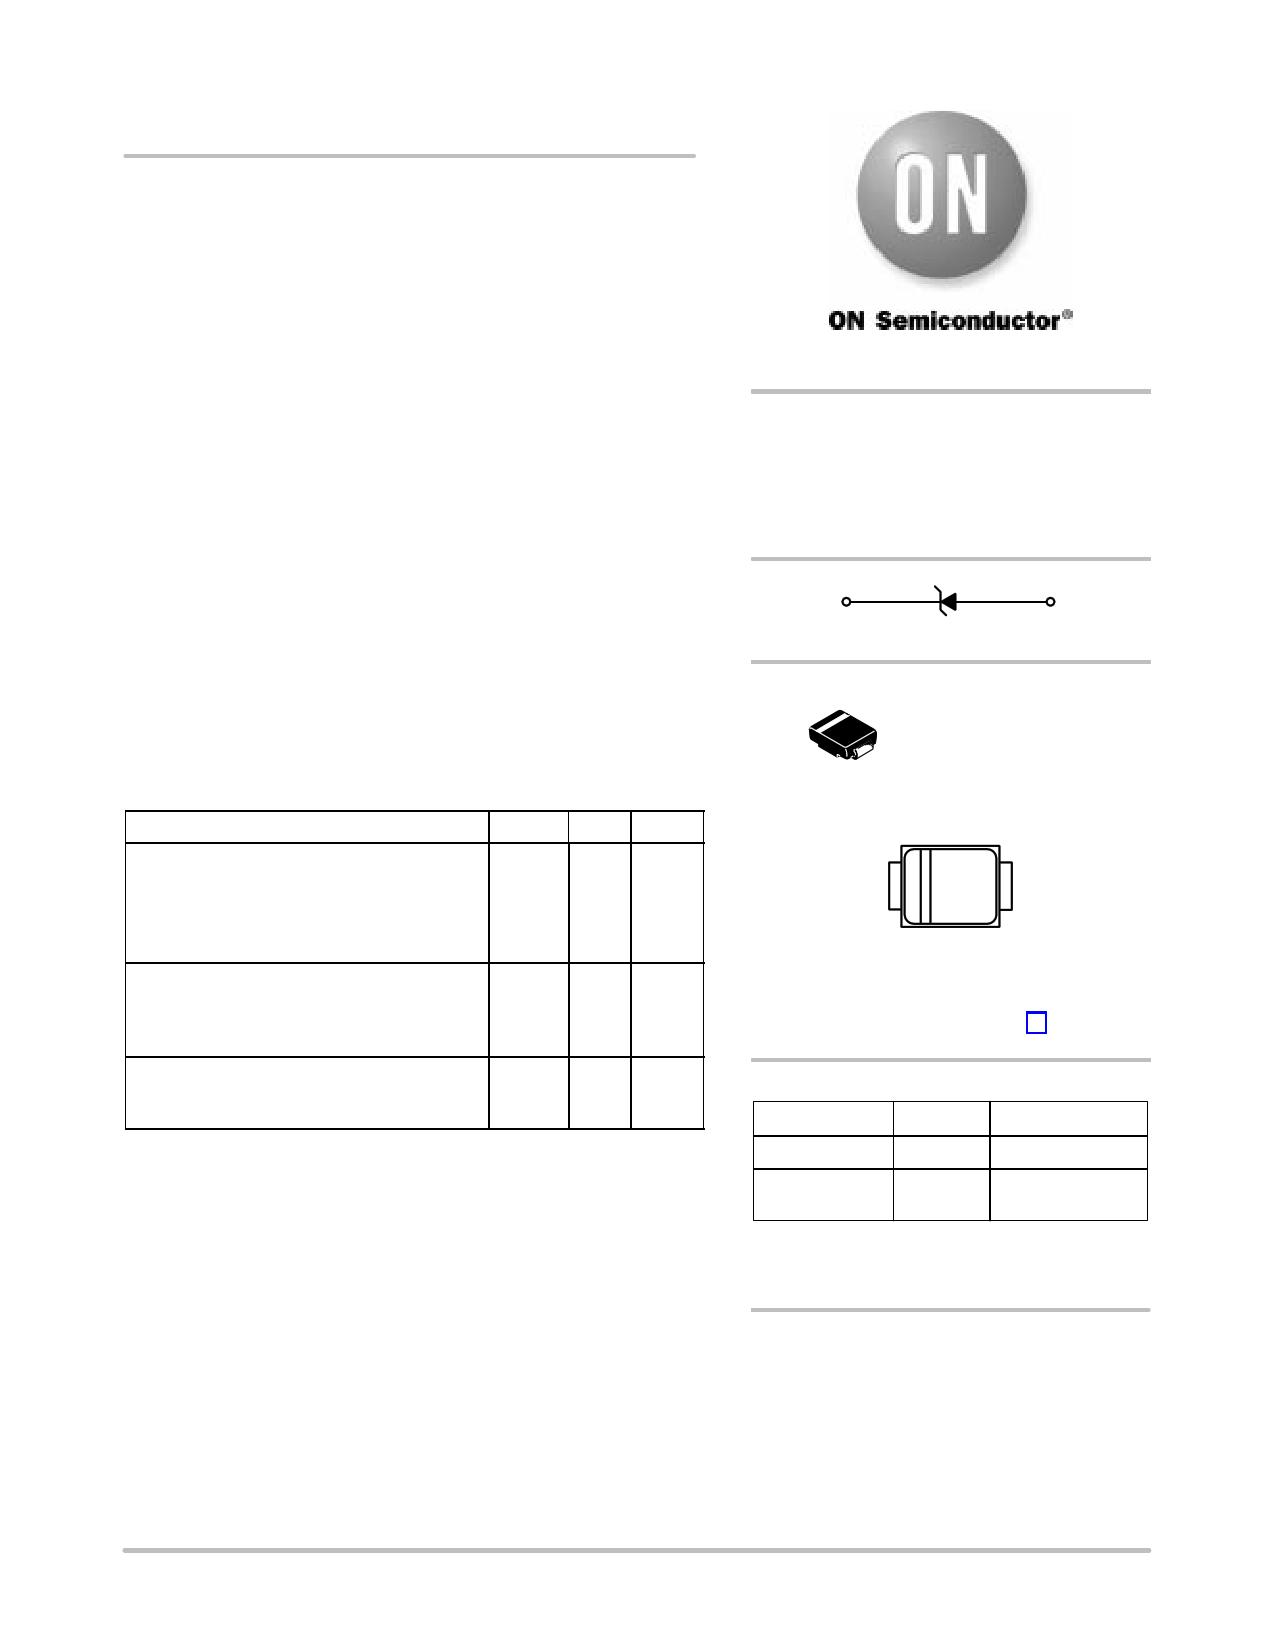 1SMB5913BT3 datasheet